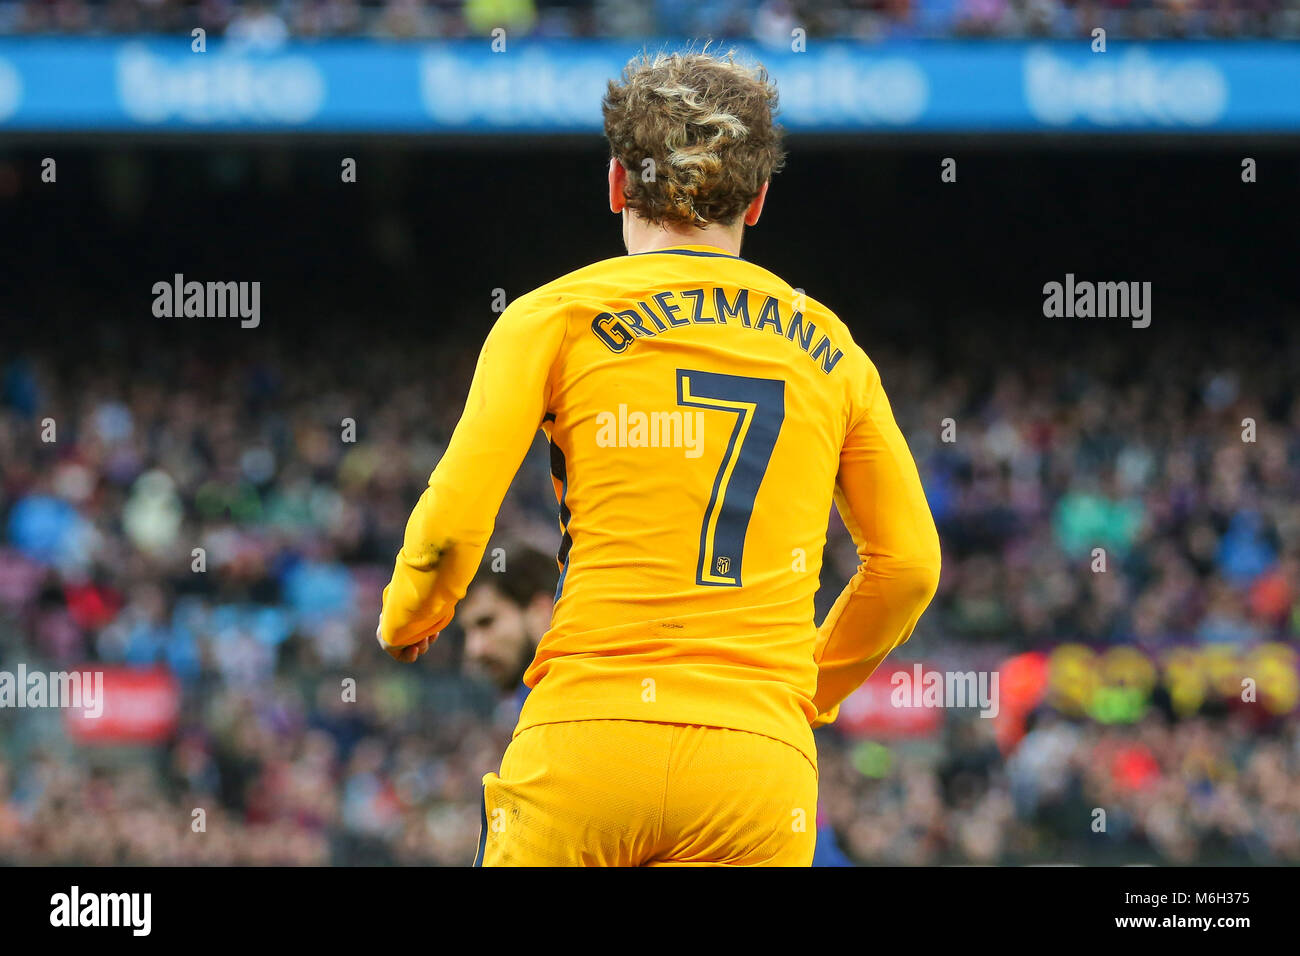 54a741e70c8 Antoine Griezmann 2018 Atletico Madrid Stock Photos   Antoine ...